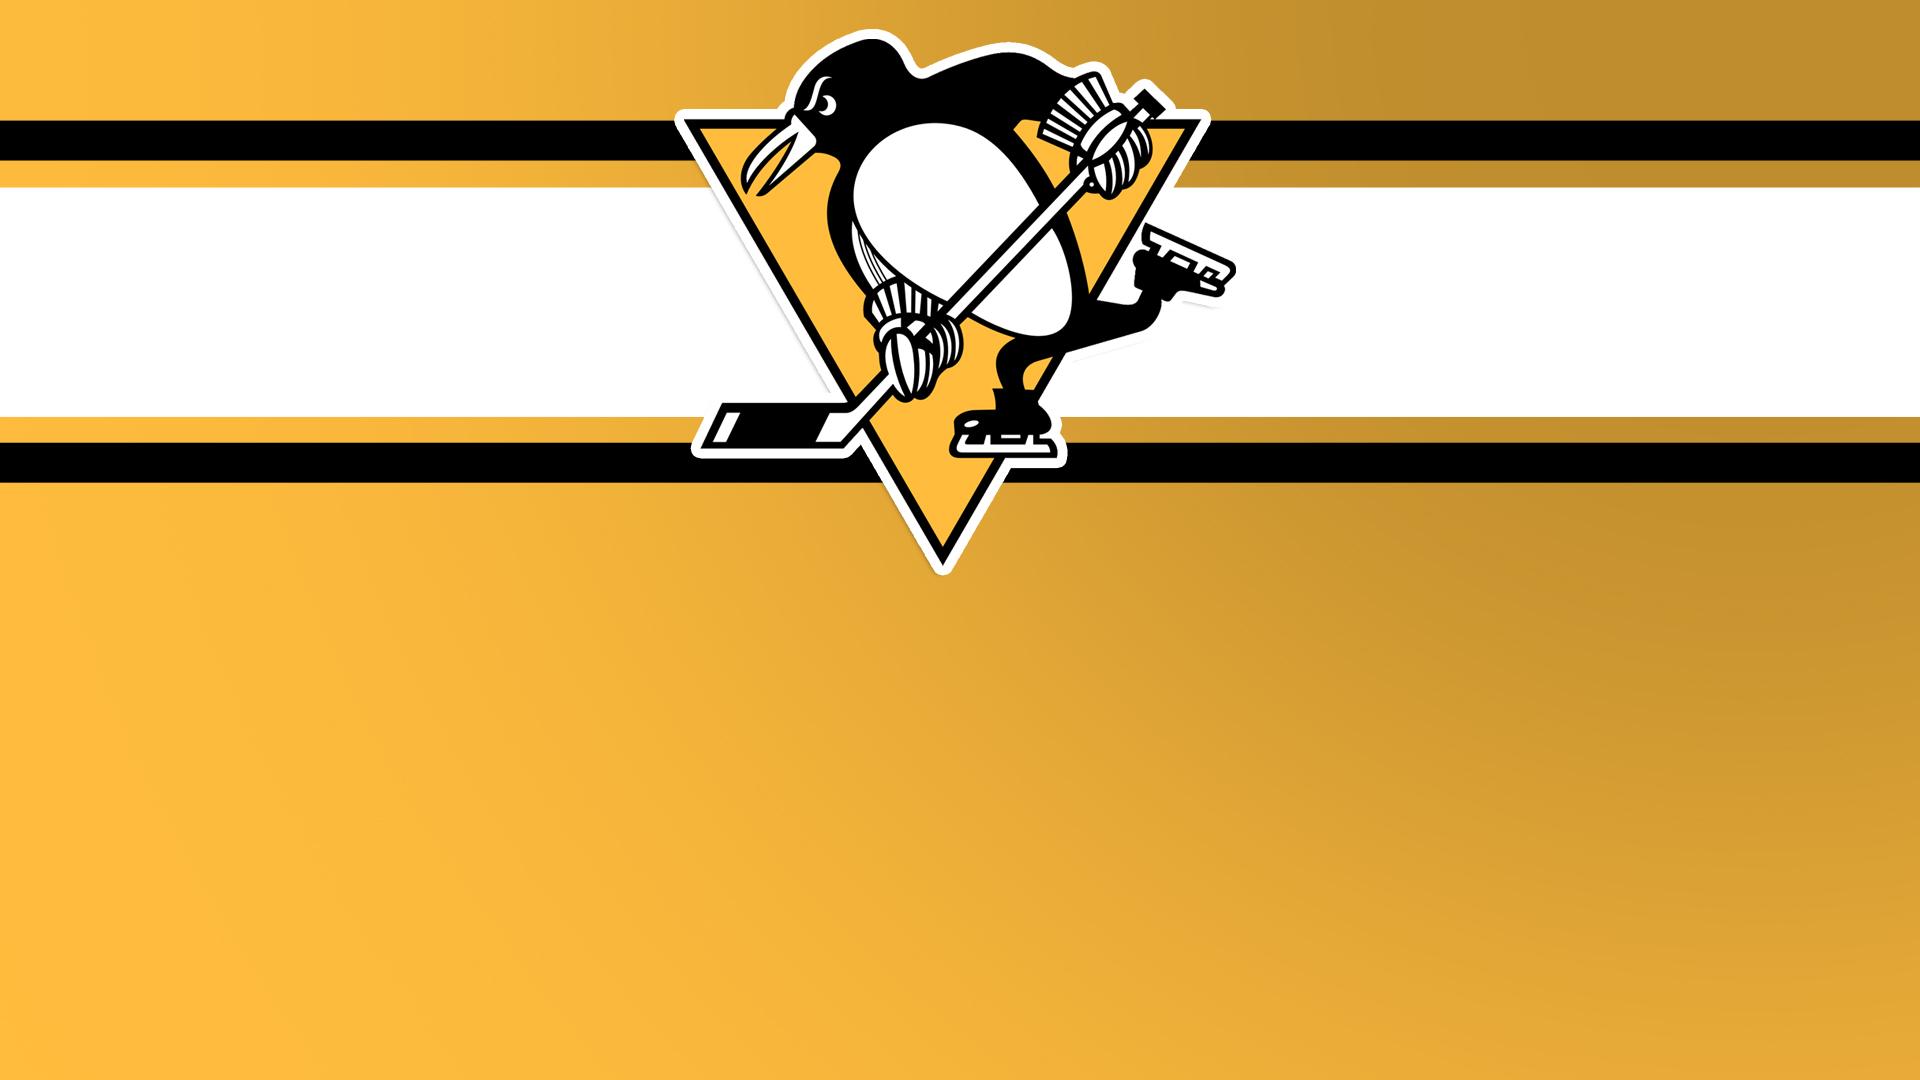 Free Download Pittsburgh Penguins Fond D233cran 1920x1080 For Your Desktop Mobile Tablet Explore 77 Pittsburgh Penguins Backgrounds Nhl Logo Wallpaper Sidney Crosby Wallpaper Pittsburgh Steelers Wallpaper